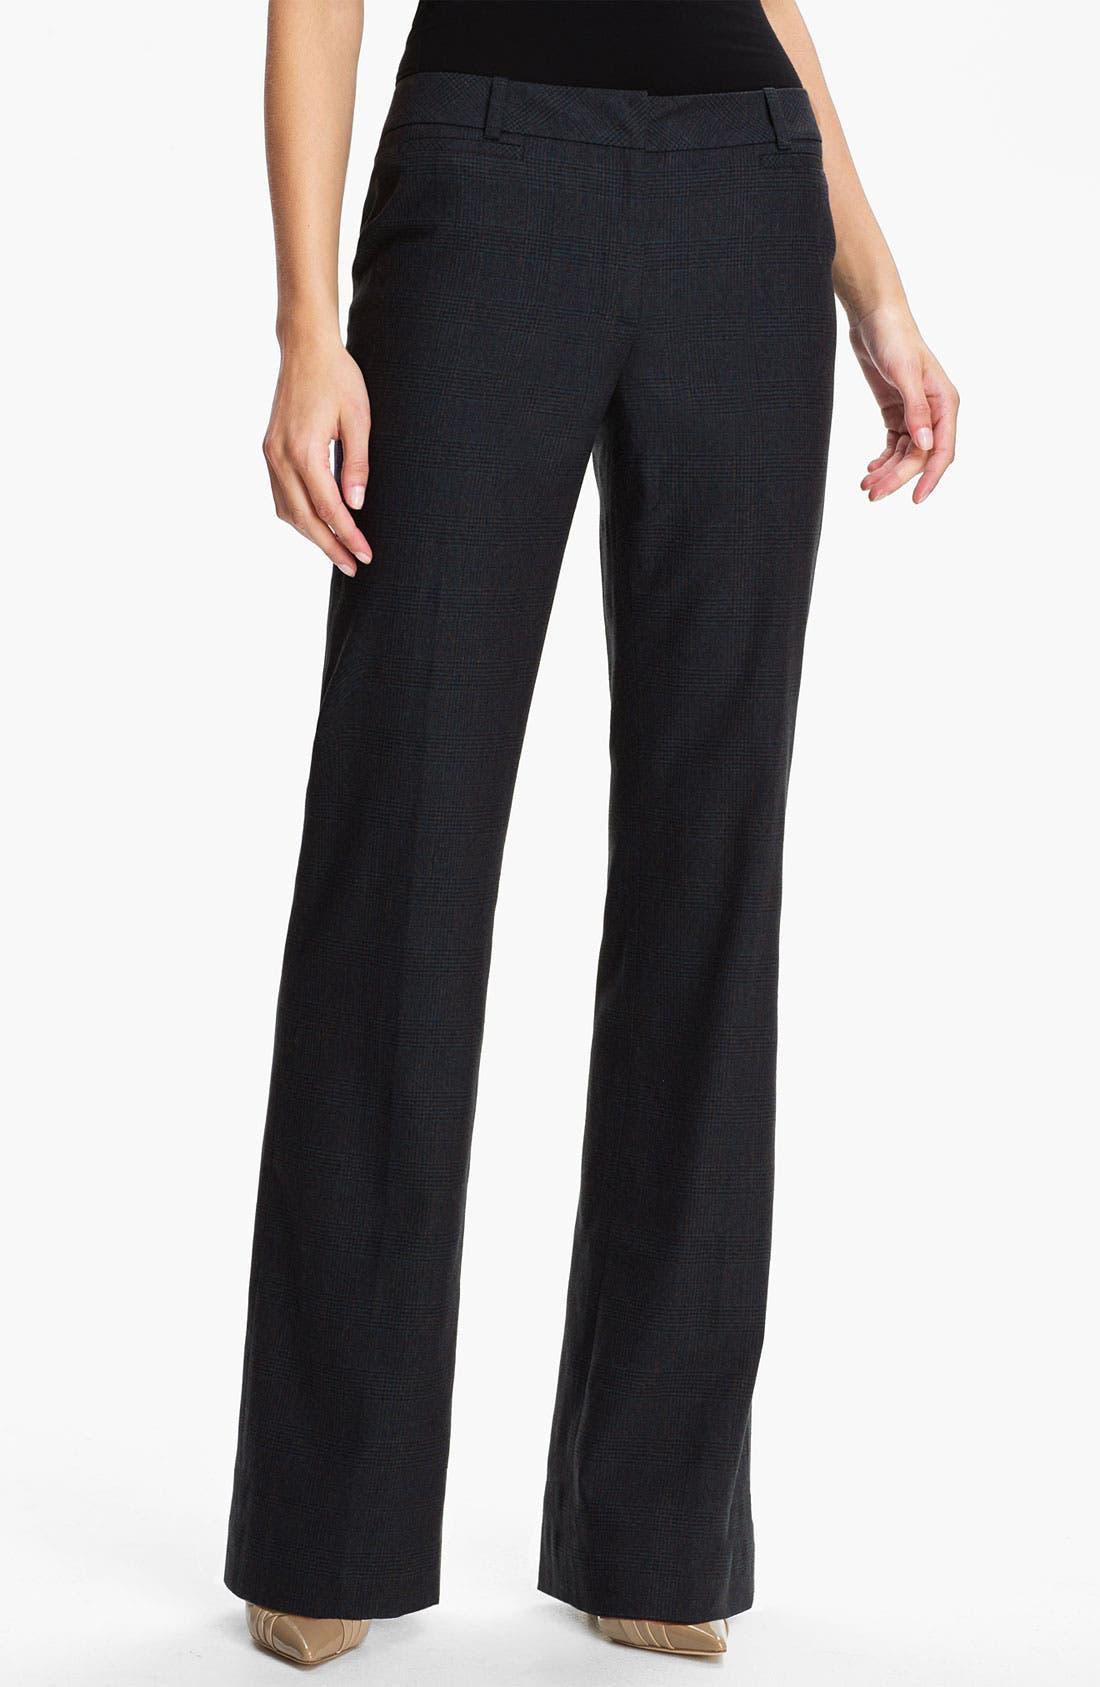 Alternate Image 1 Selected - Classiques Entier® 'Adima Check' Pants